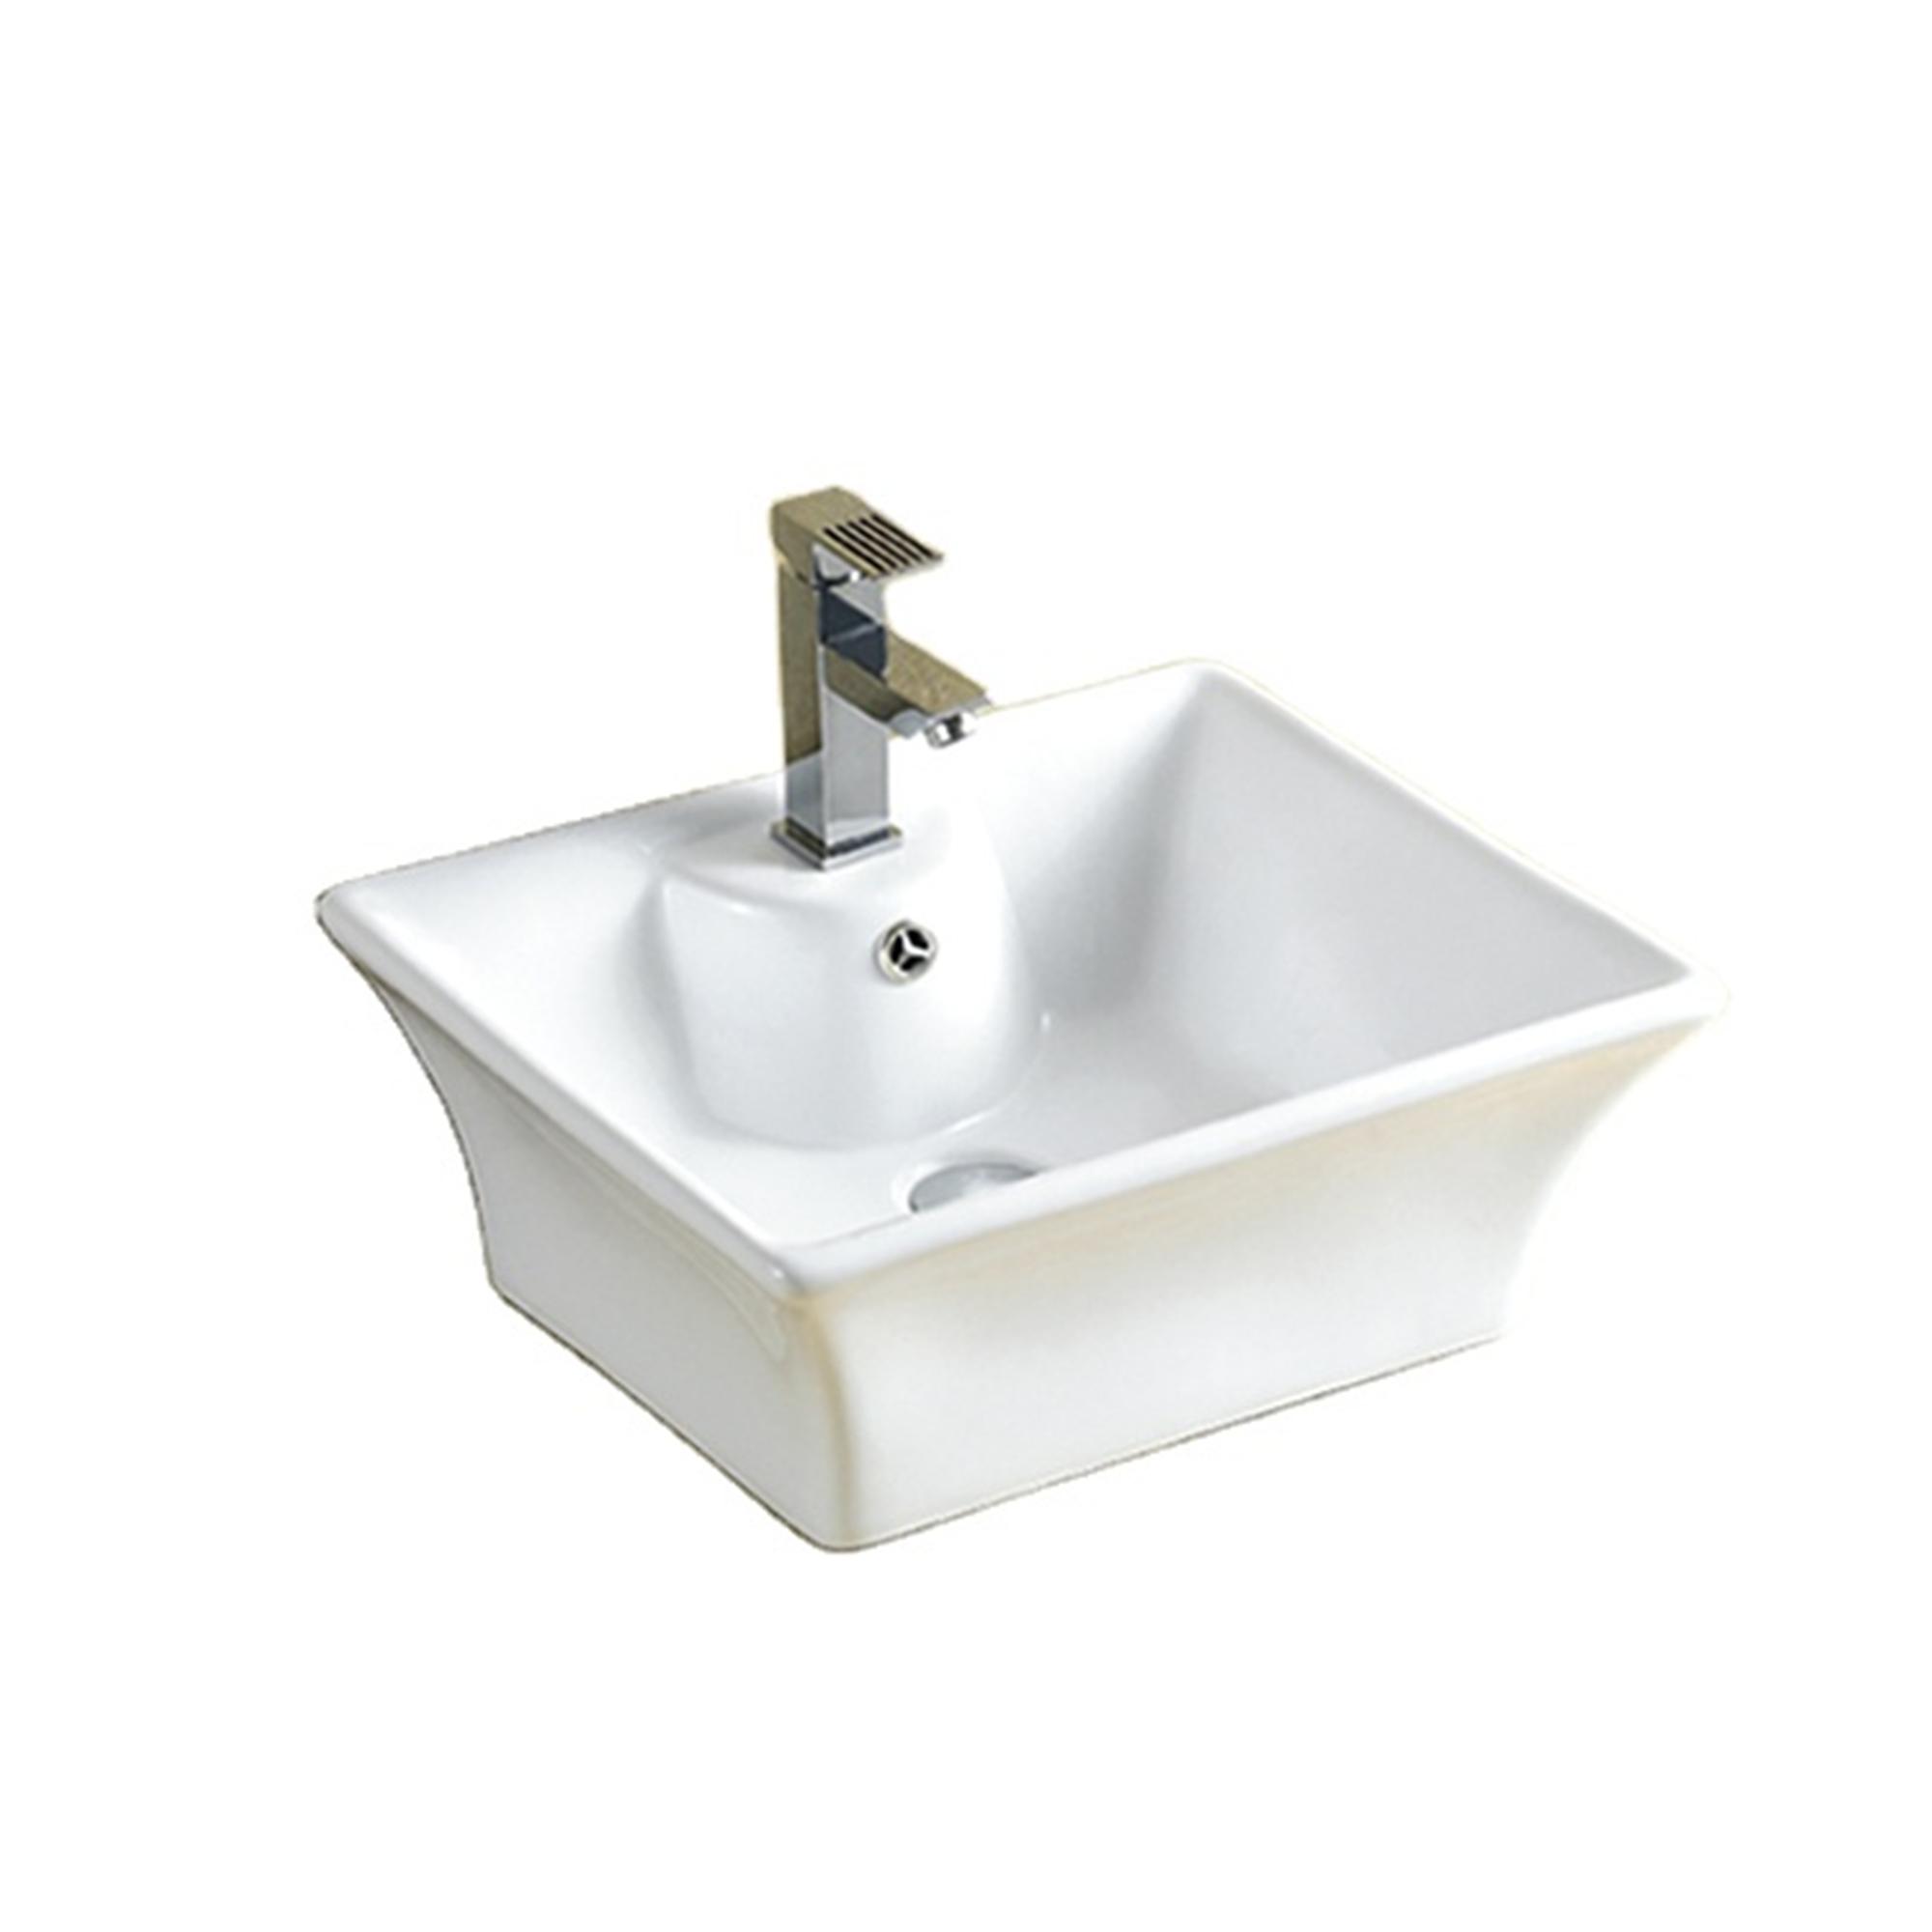 First-8006 White Luxury Designs Ceramic Lavabo Bathroom Sinks Wash Basin